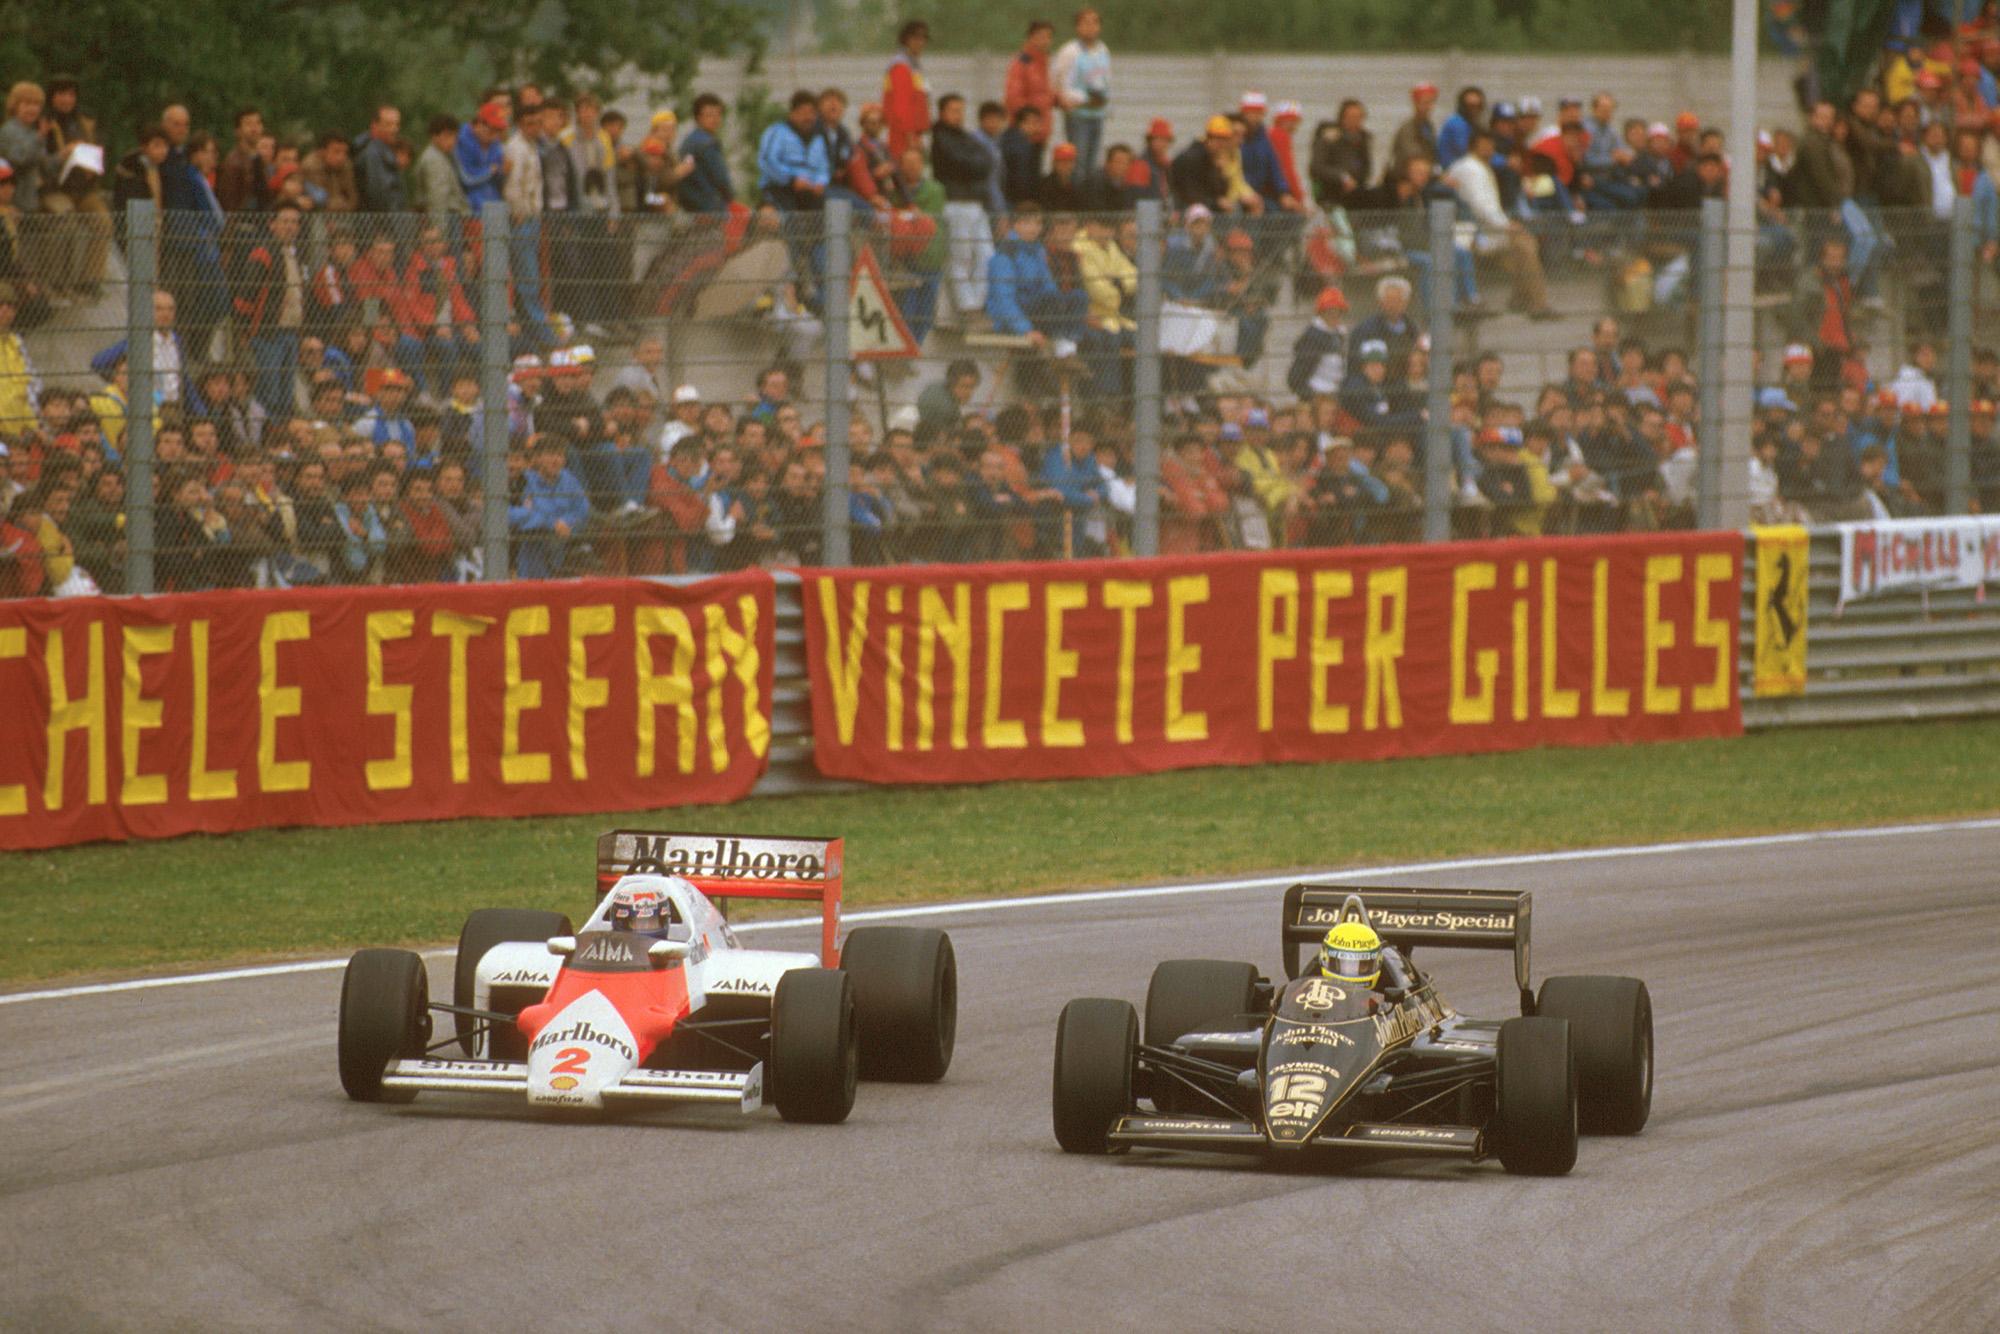 Alain Prost overtakes Ayrton Senna in the 1985 San Marino Grand Prix